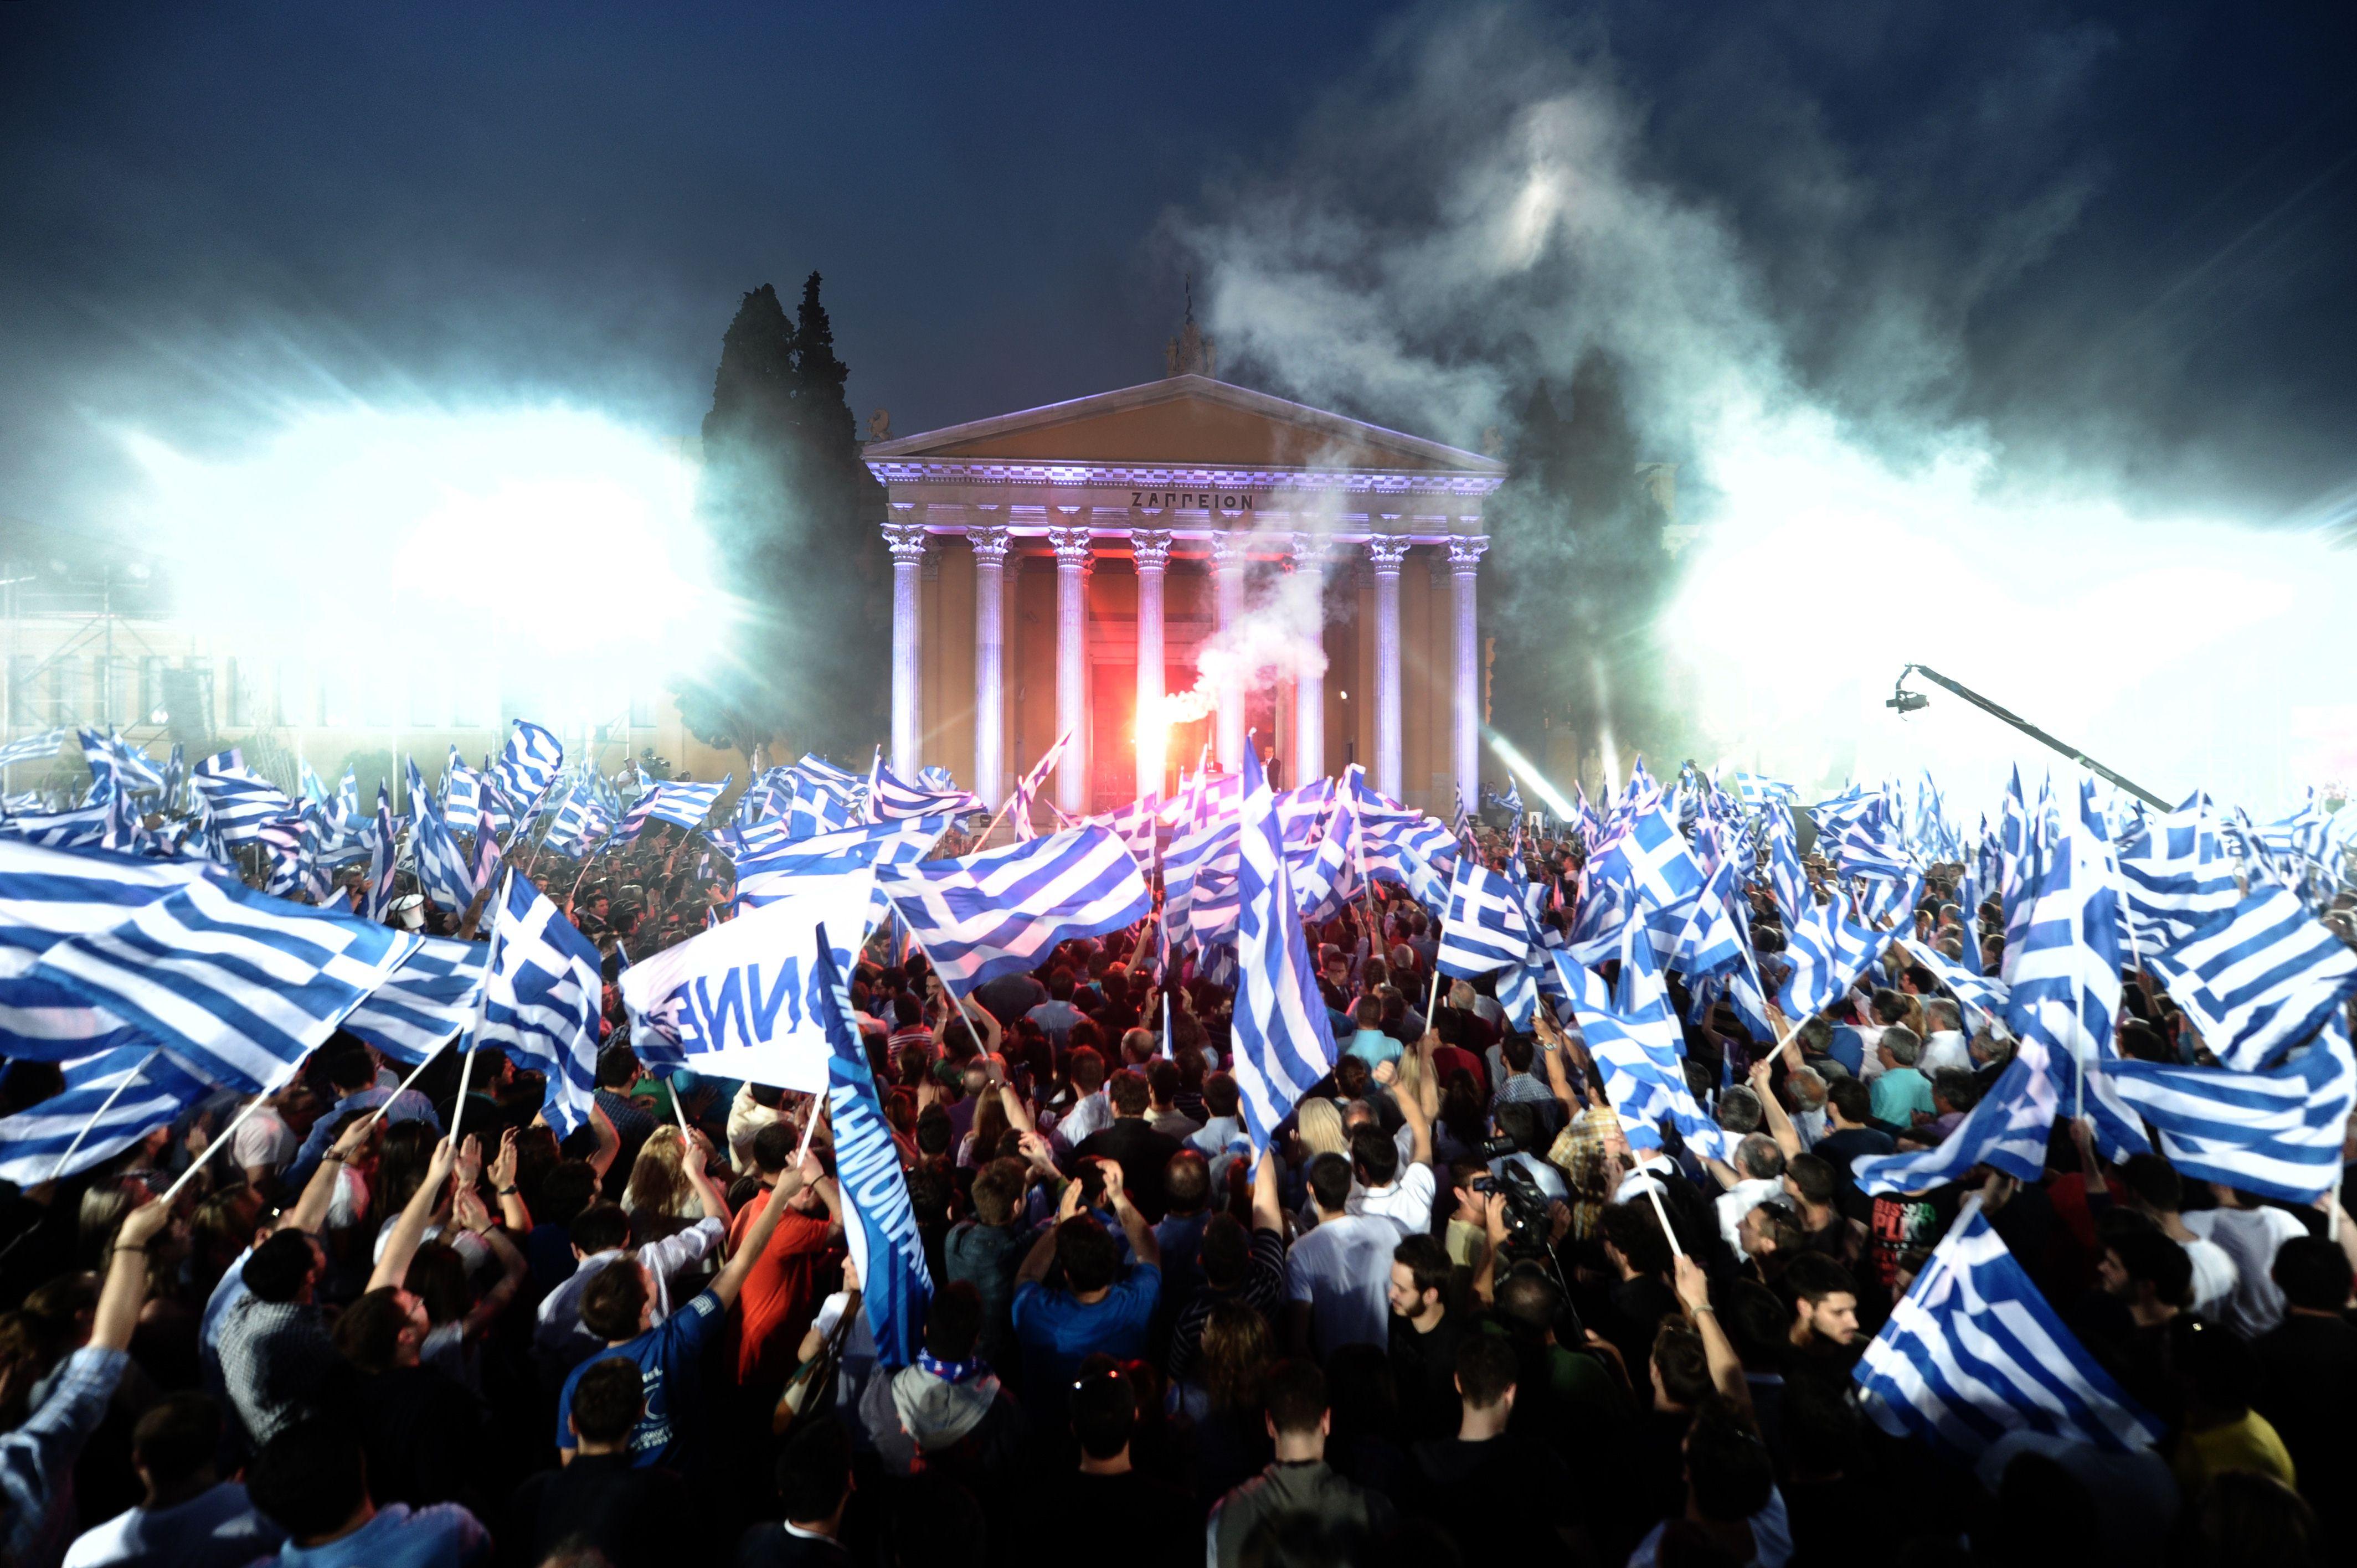 TOPSHOTS / AFP PHOTO / ARIS MESSINIS